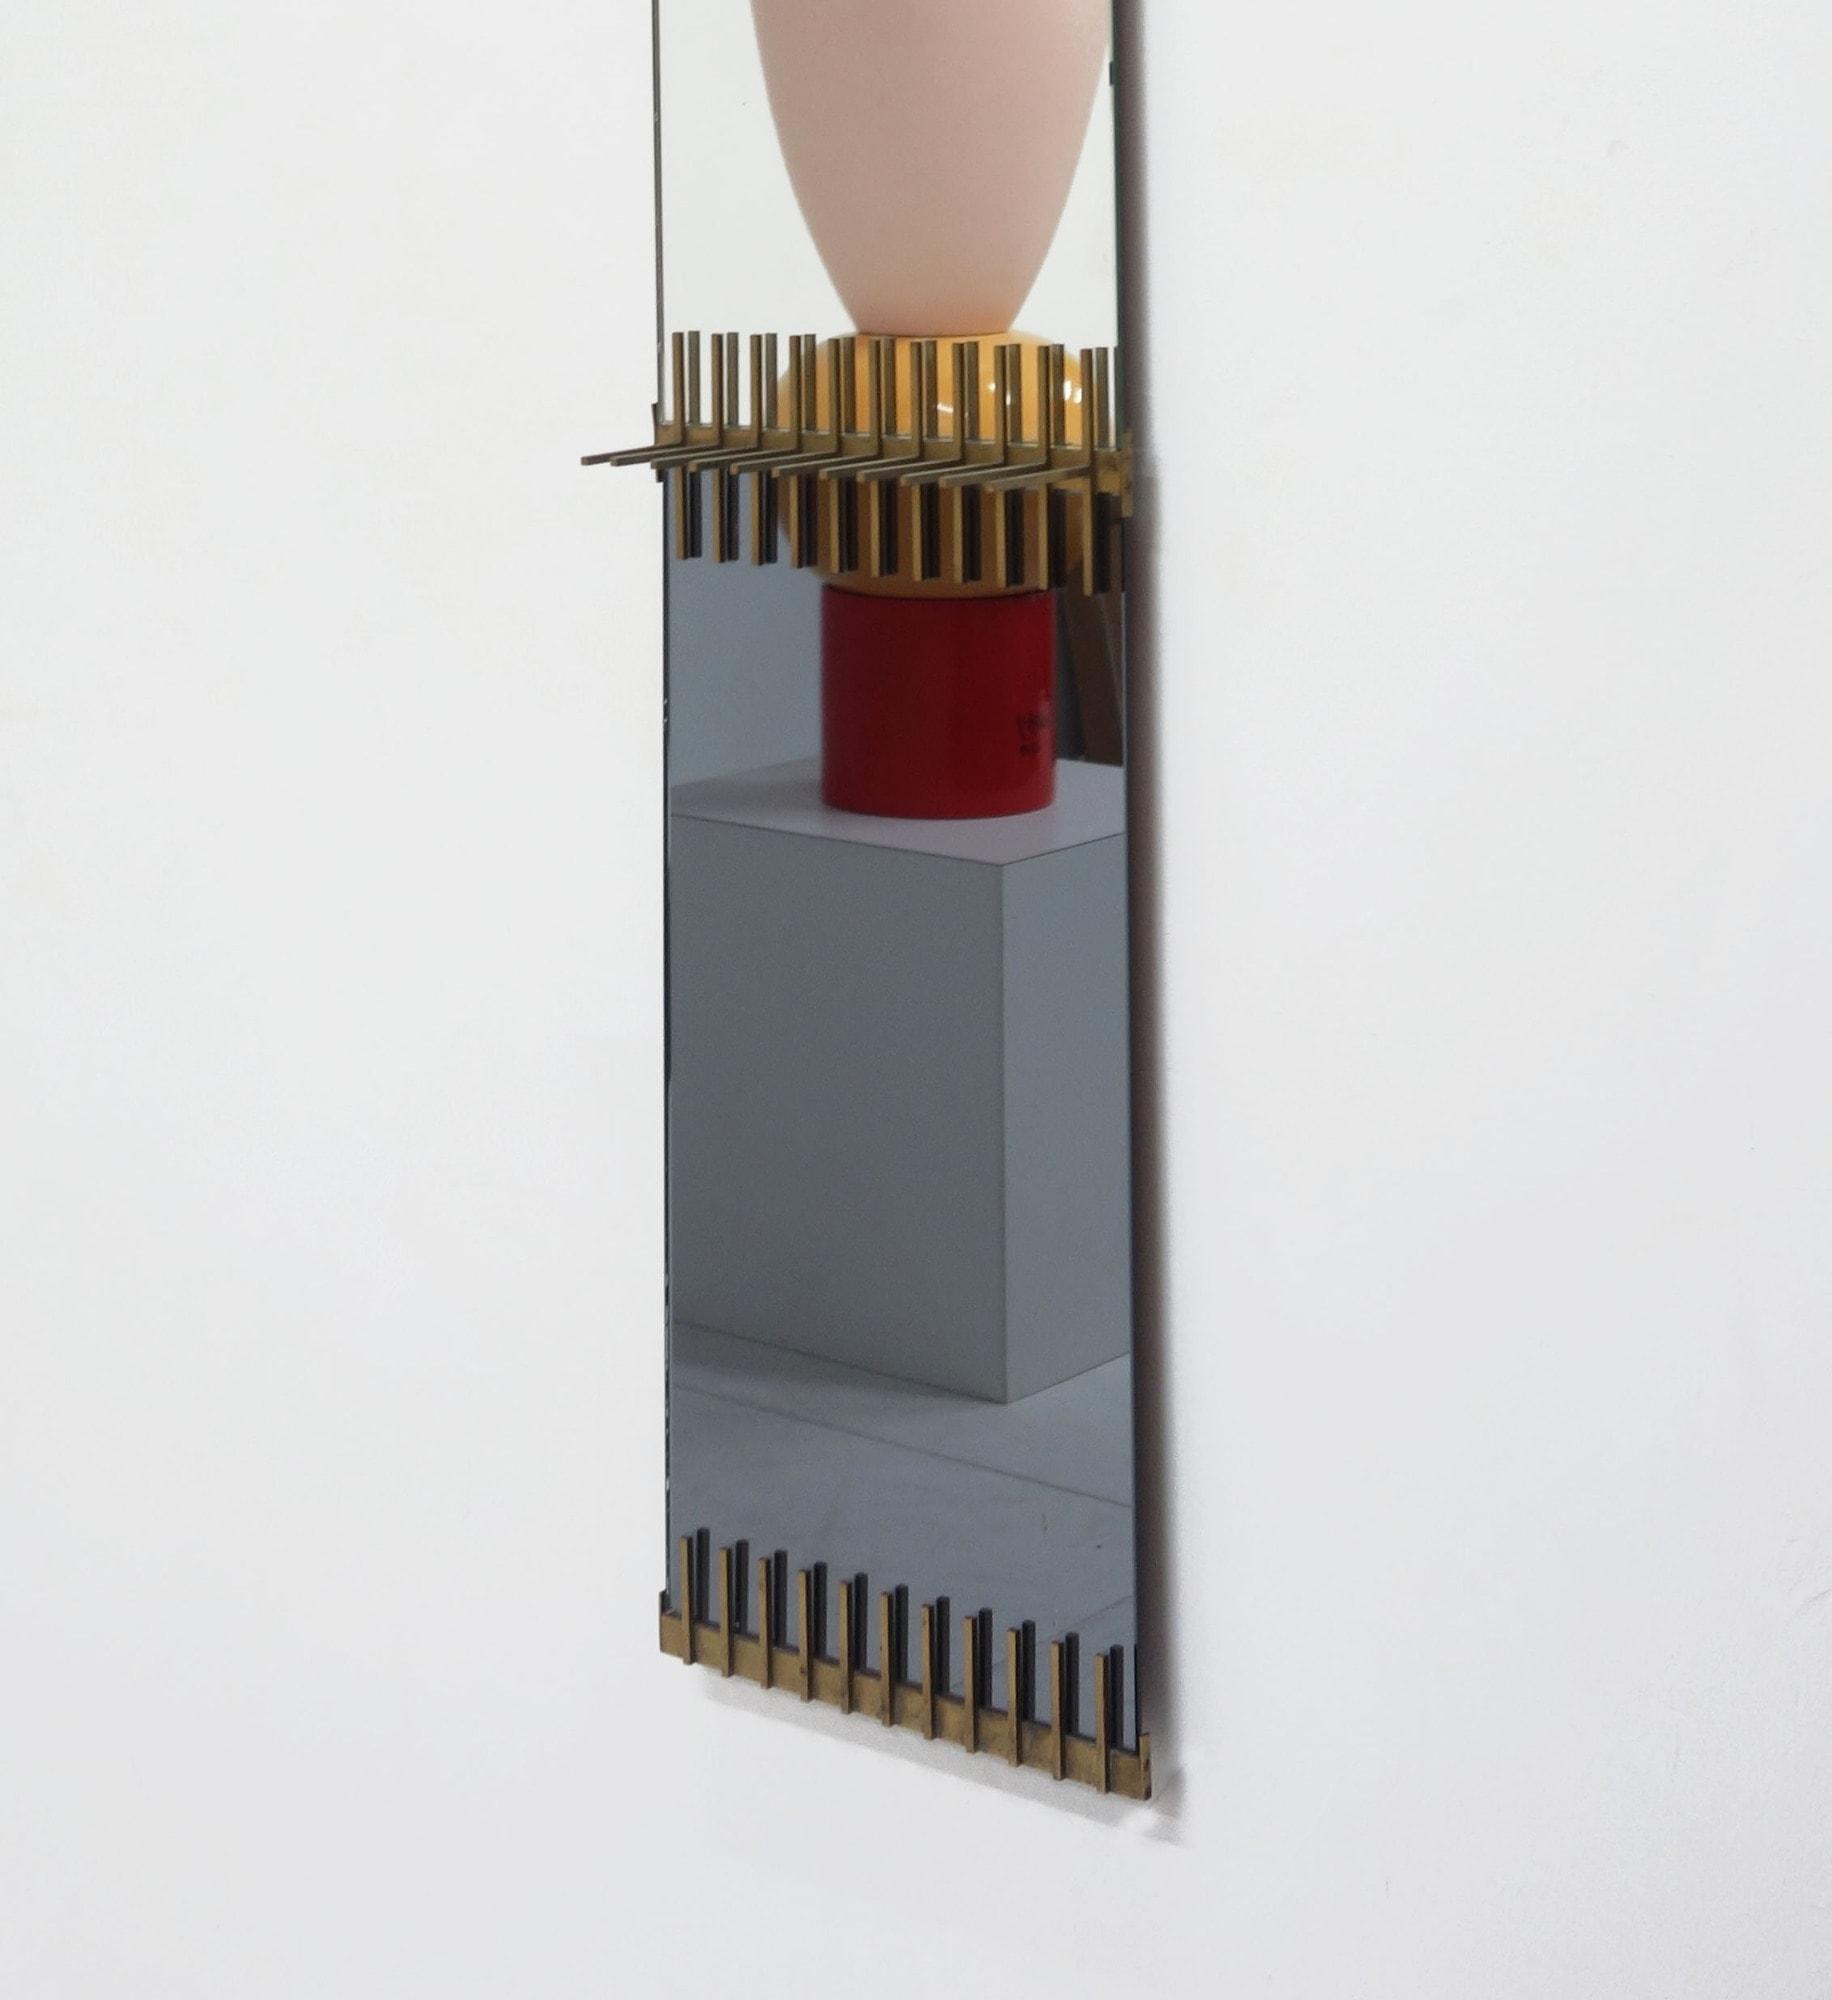 Ettore Sottsass, Rare mirror, vue 02